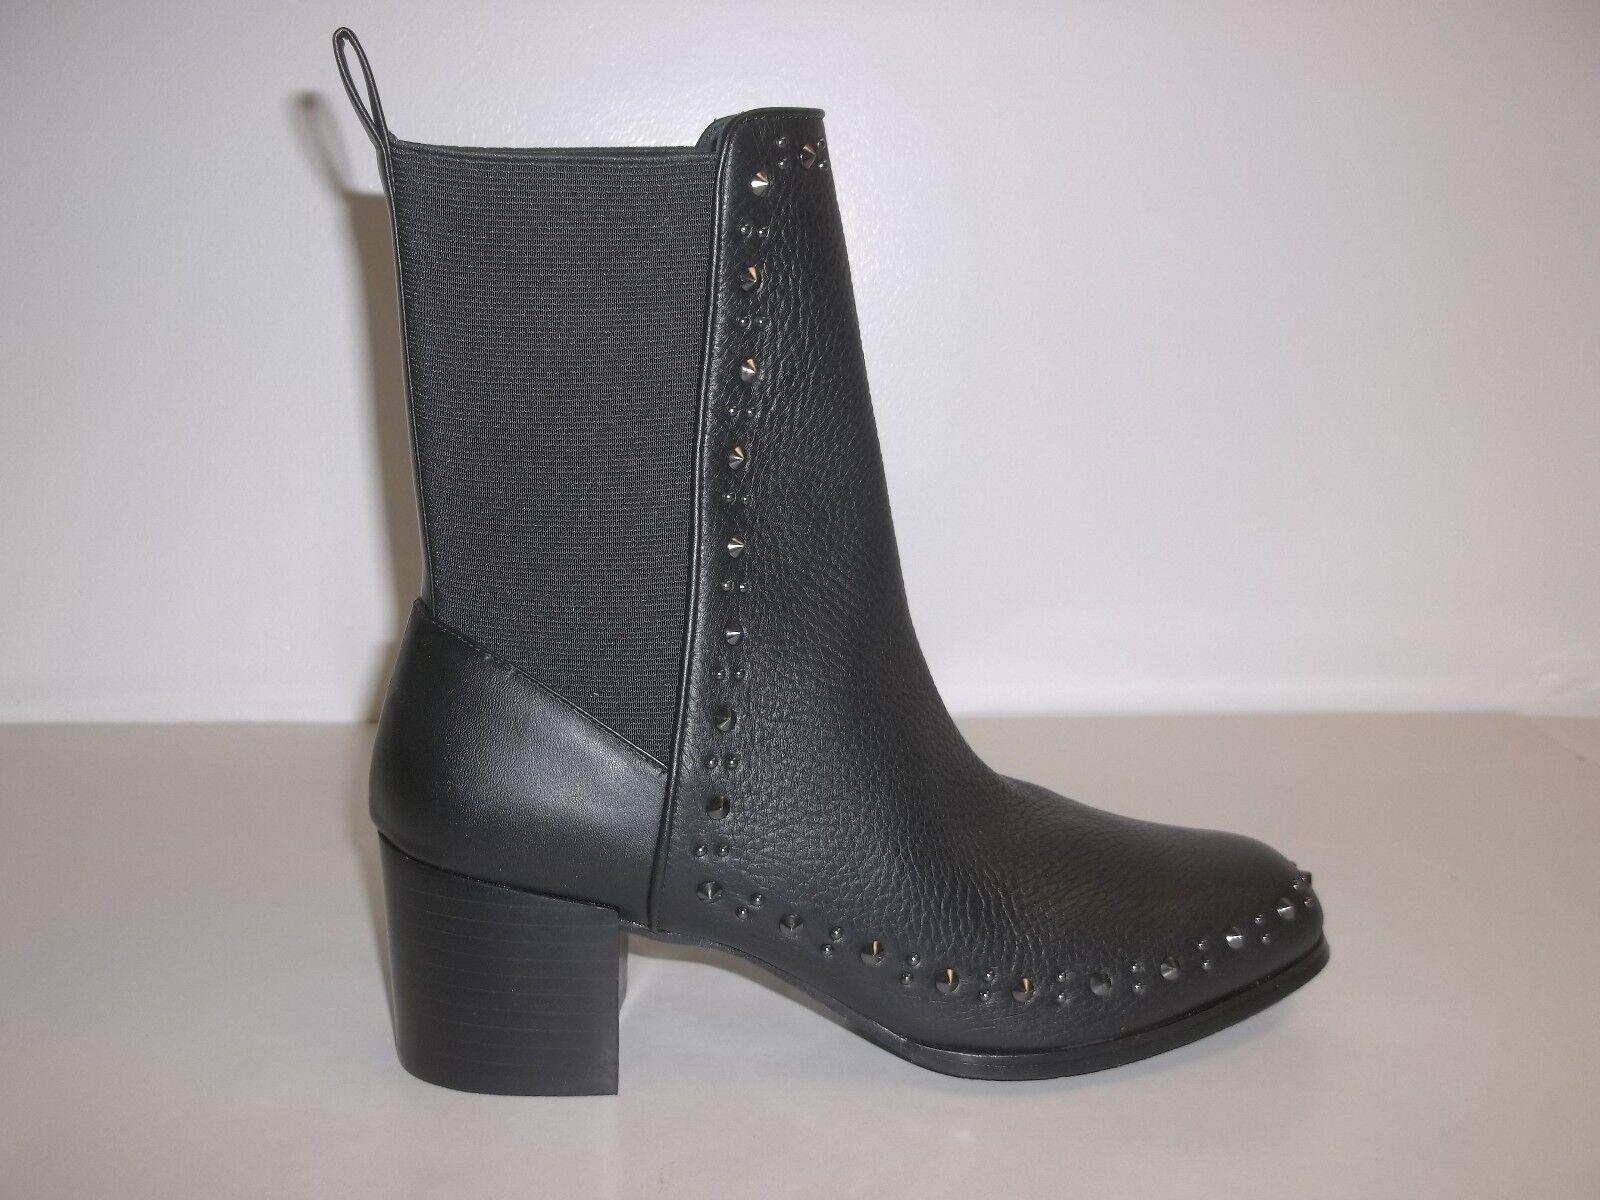 Adrianna Papell Papell Papell tamaño 9.5 M Bennett Cuero Negro botas Mitad de Pantorrilla Nuevos Mujer Zapatos  Centro comercial profesional integrado en línea.